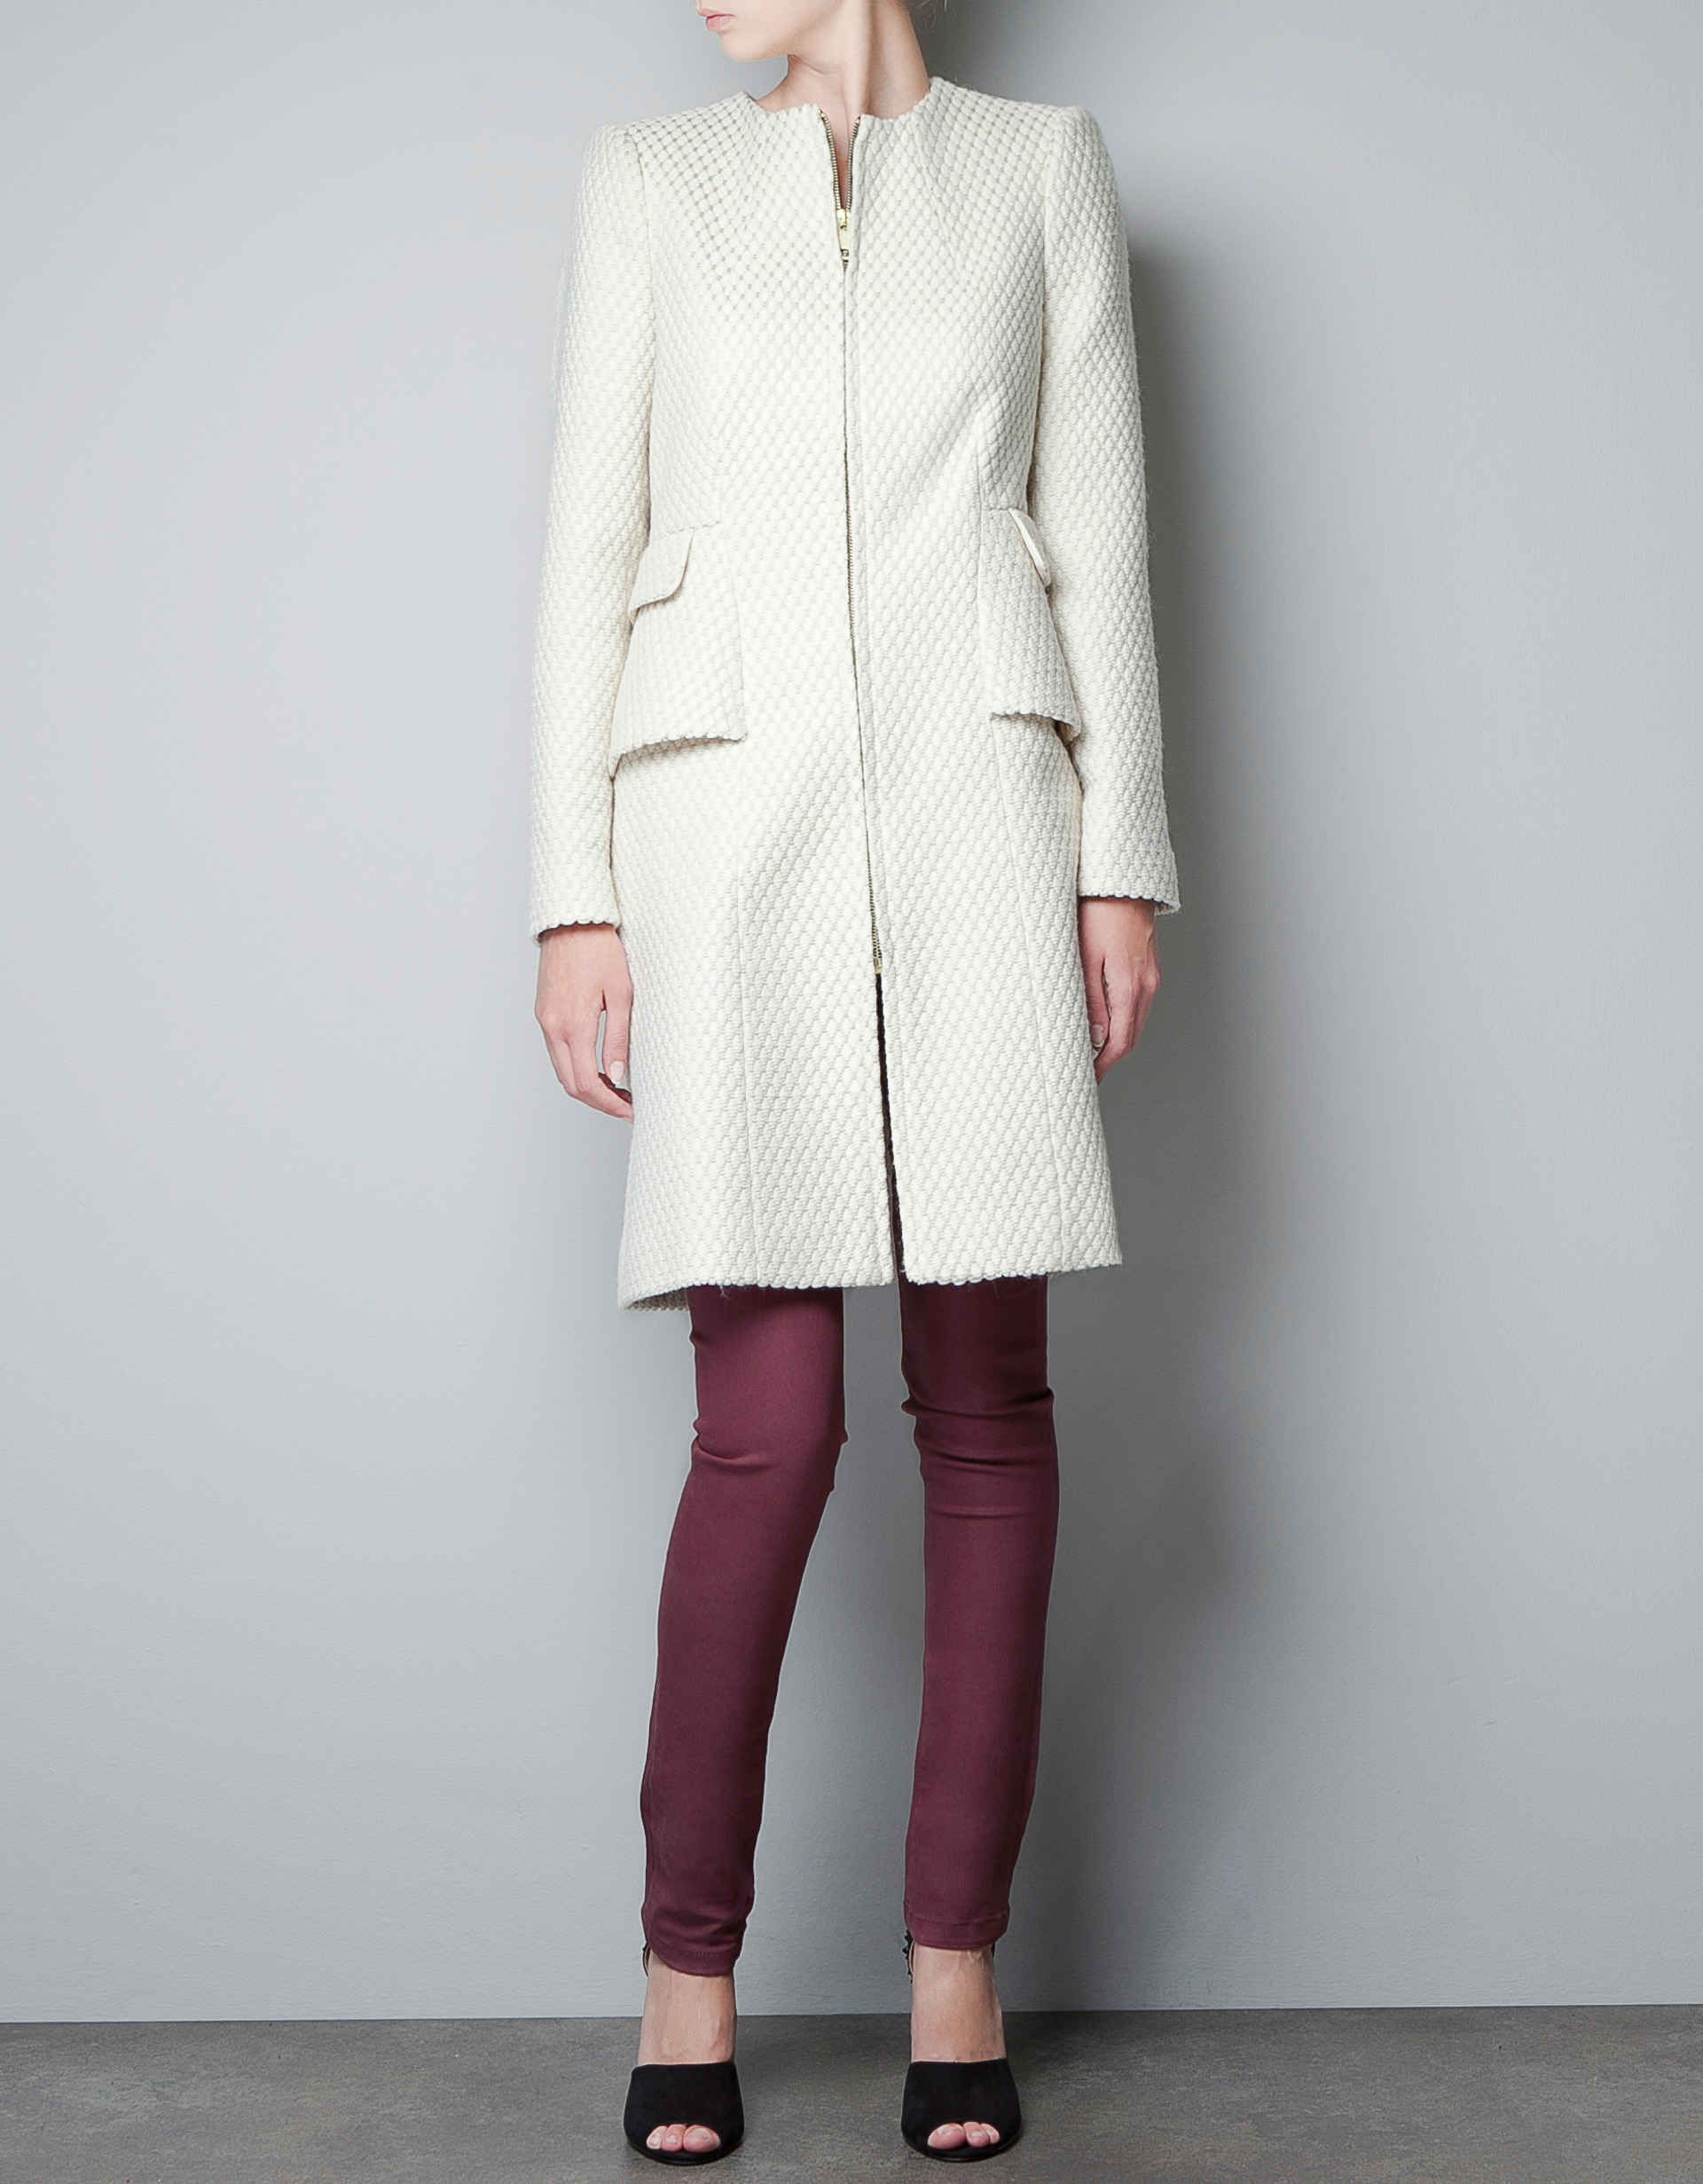 Zara Fantasy Wool Jacquard Coat in White | Lyst